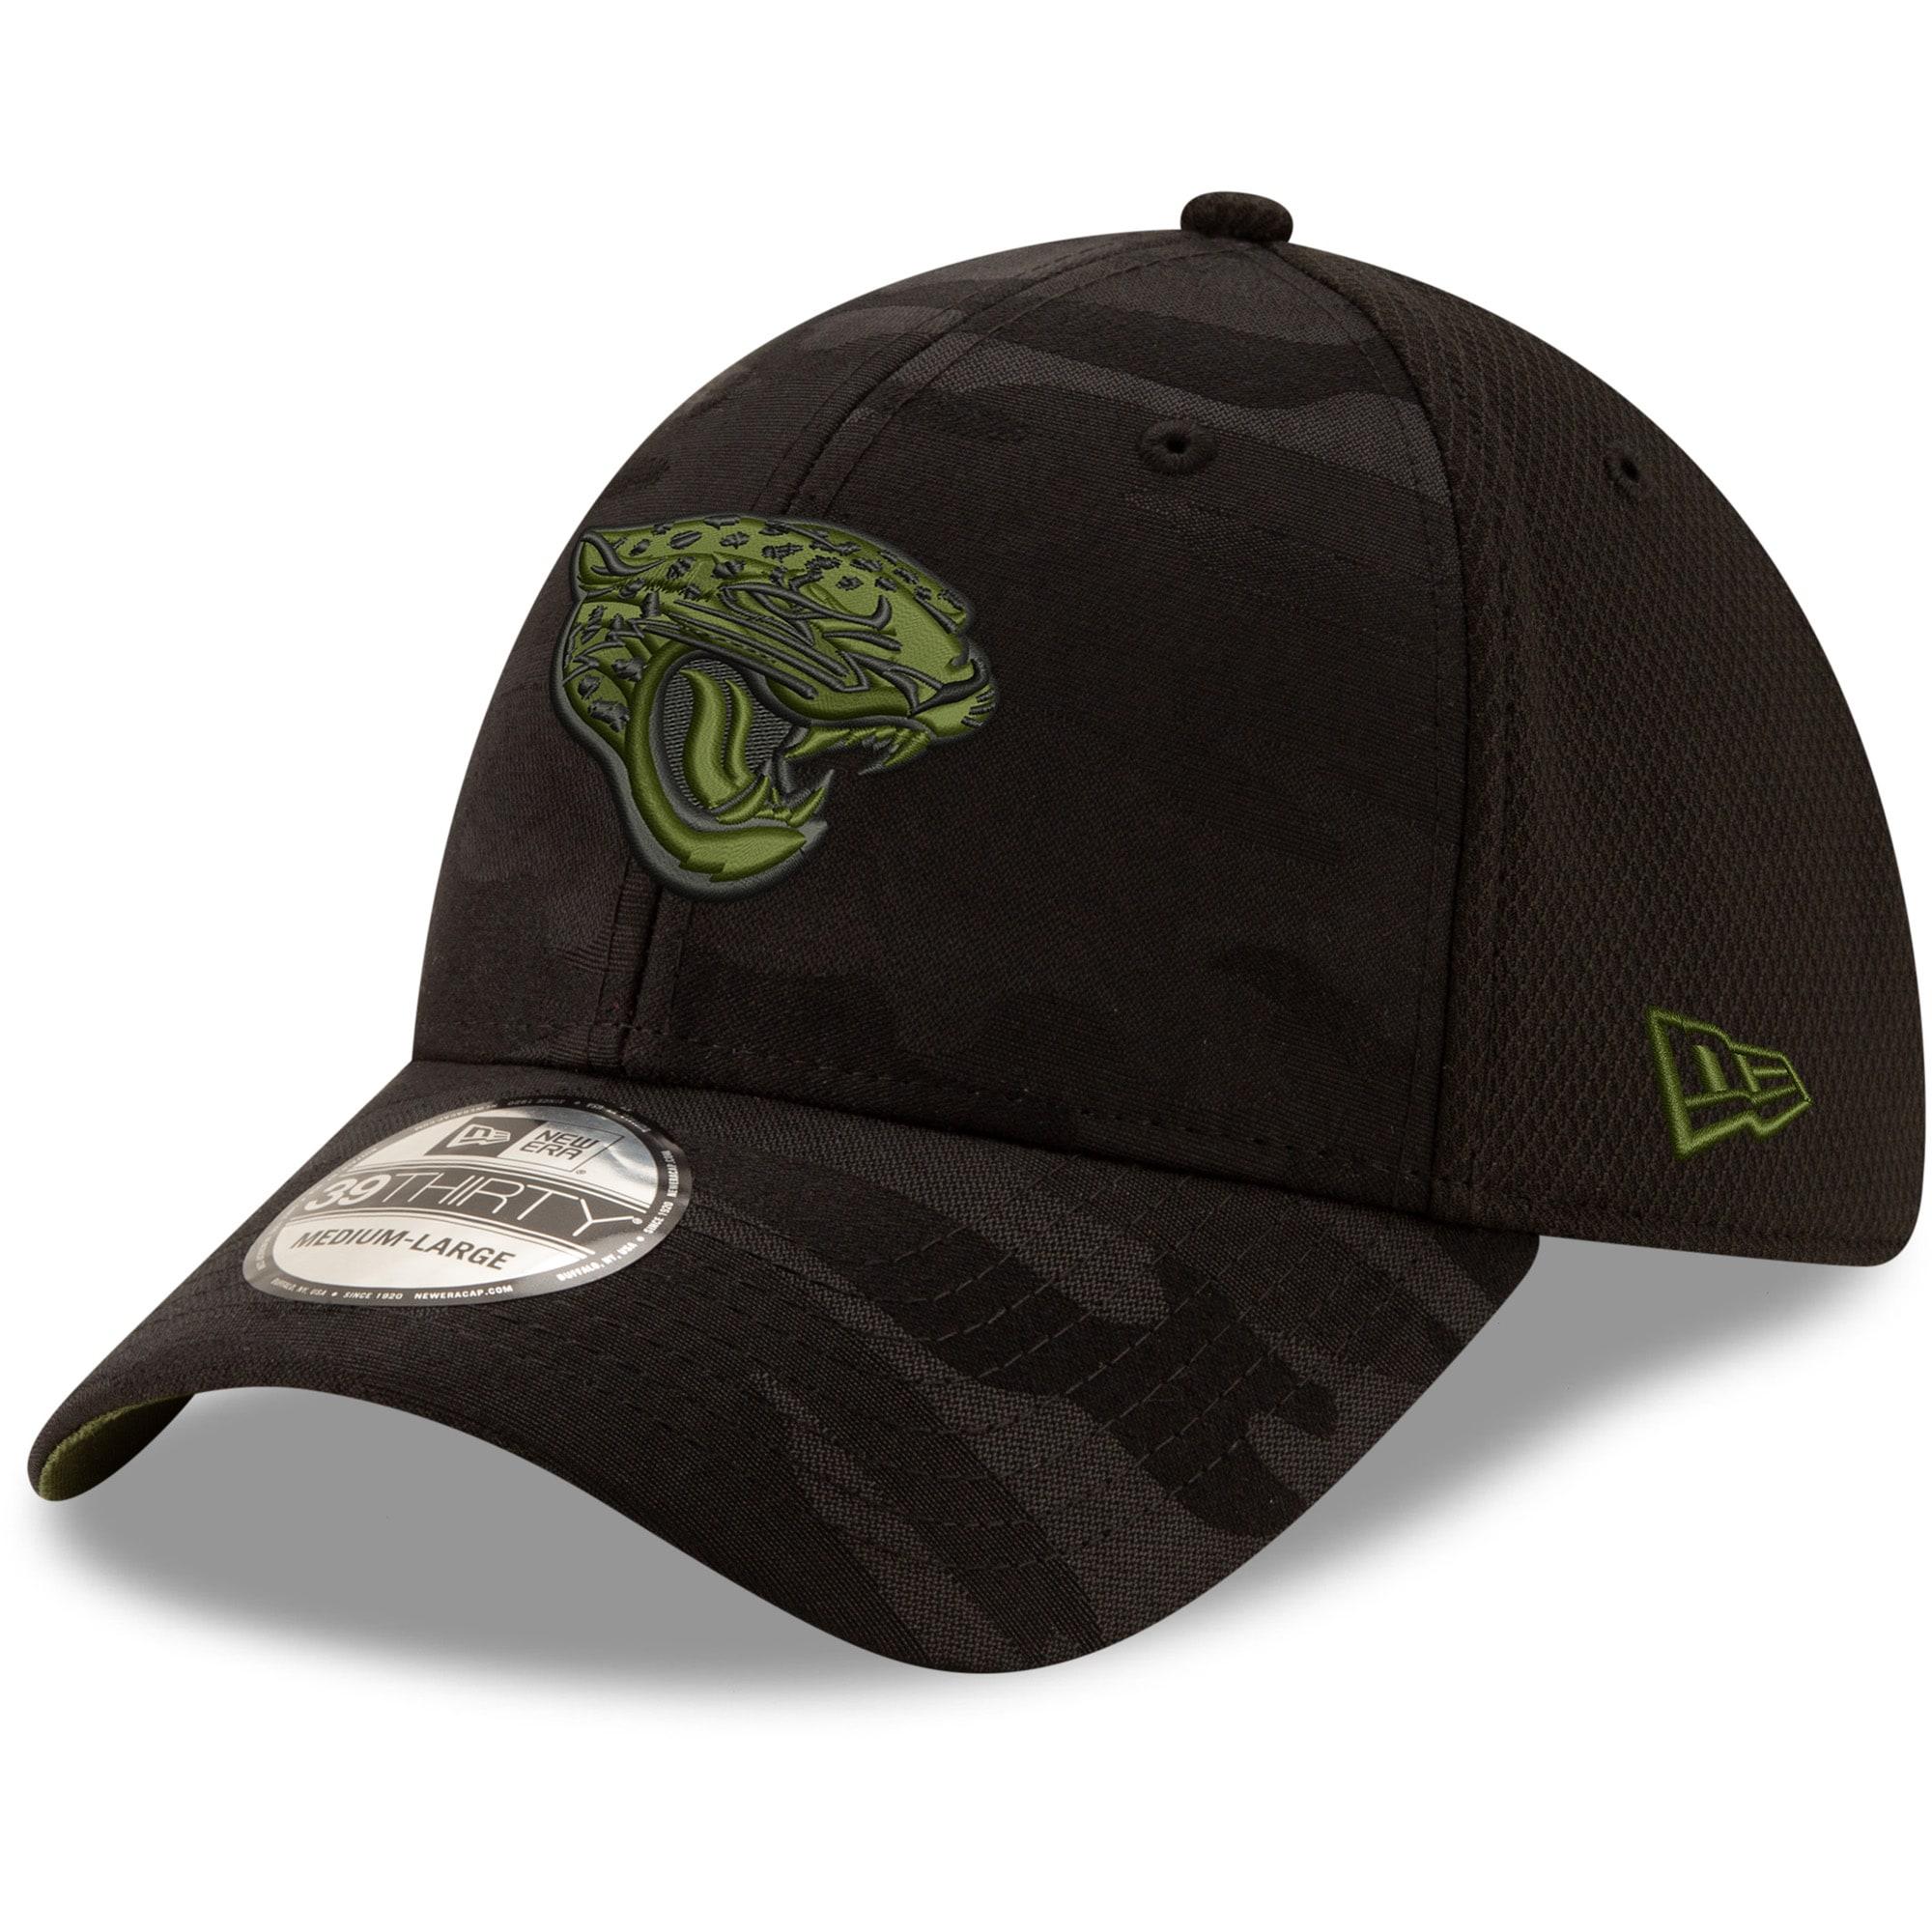 Jacksonville Jaguars New Era Camo Royale 39THIRTY Flex Hat - Black